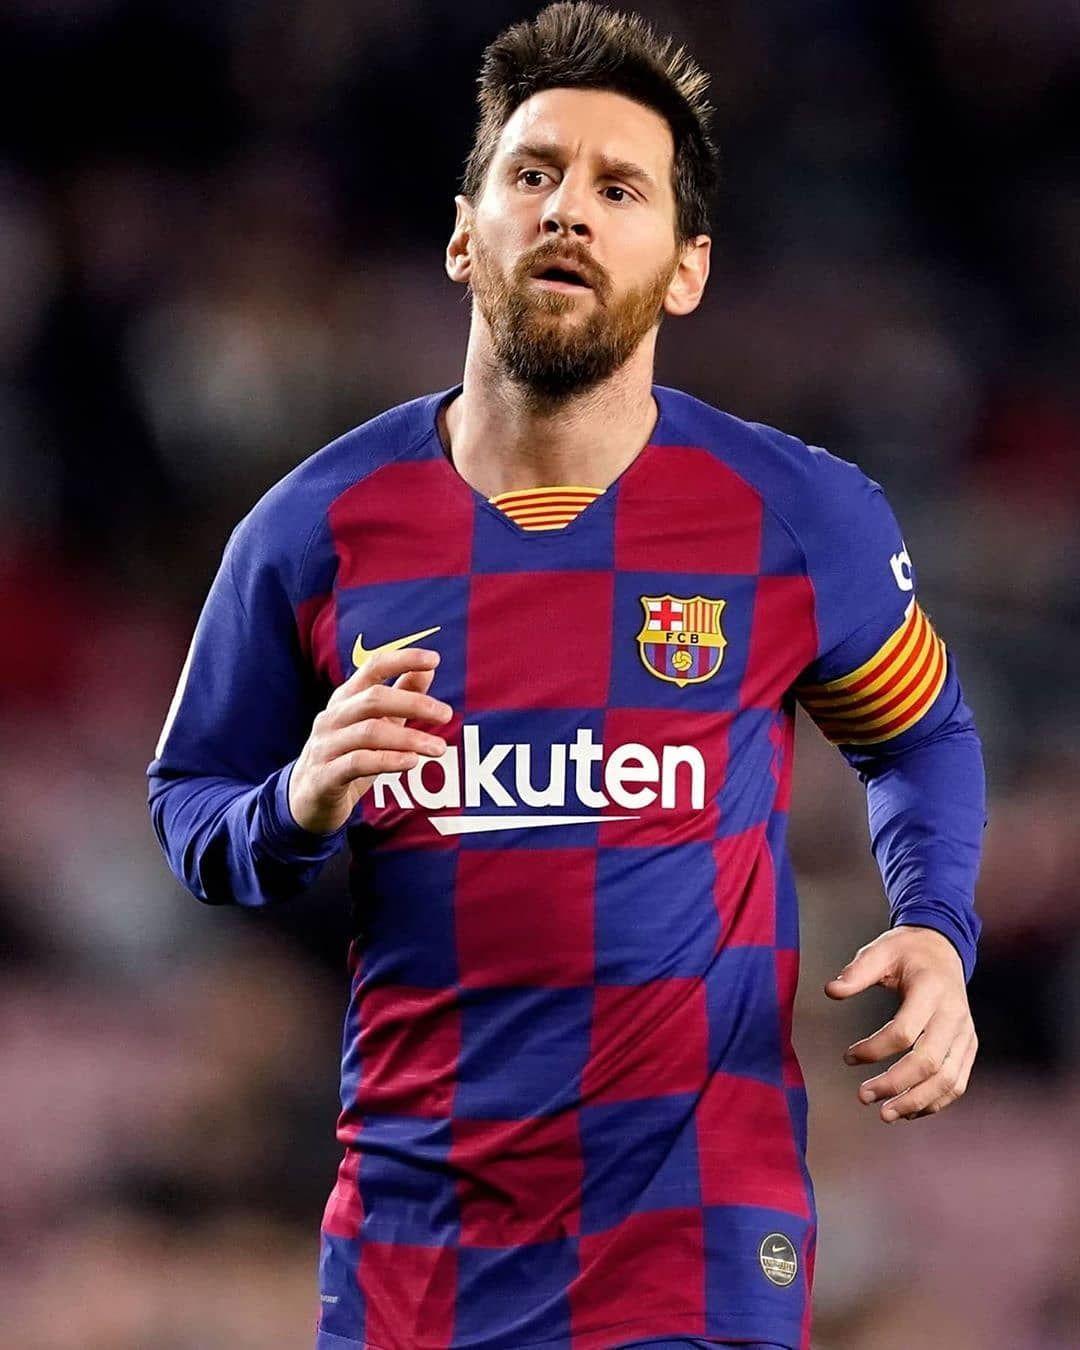 Ansu Fati Ansufati Championsleague Uefachampionsleague Legendsoftomorrow Campnou Sansiro Fcbarcelona Barca Barca Barce In 2020 Lionel Messi Messi Leo Messi